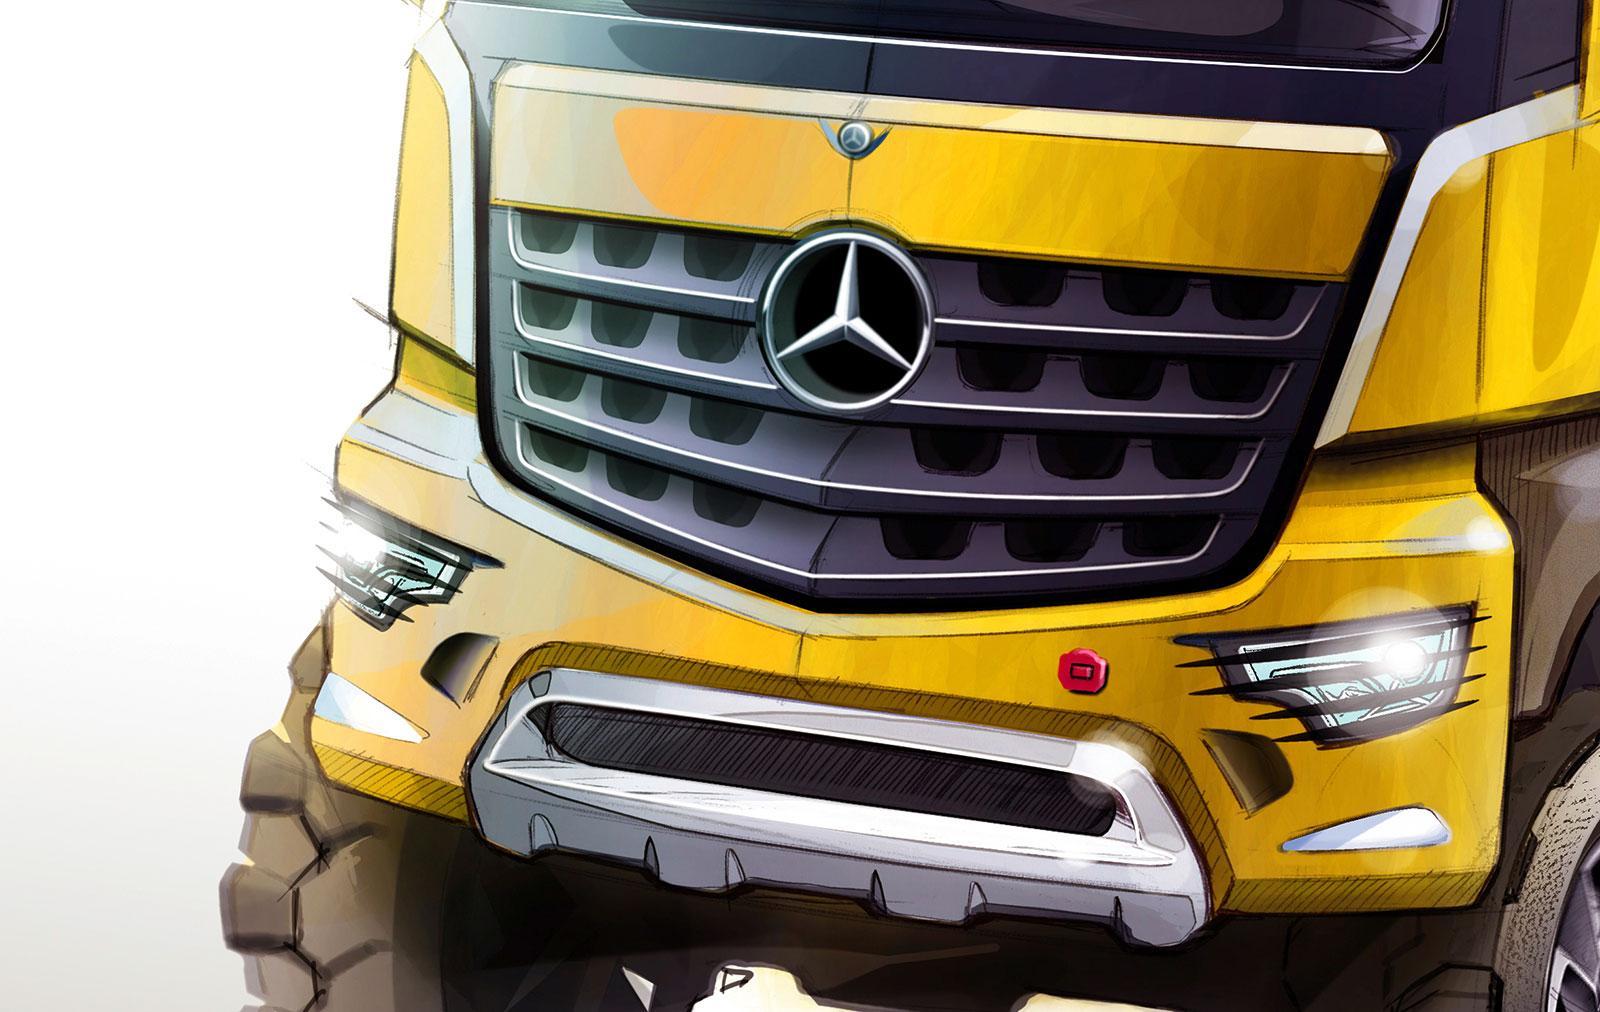 Mercedes benz arocs design sketch detail car body design for Mercedes benz detailing